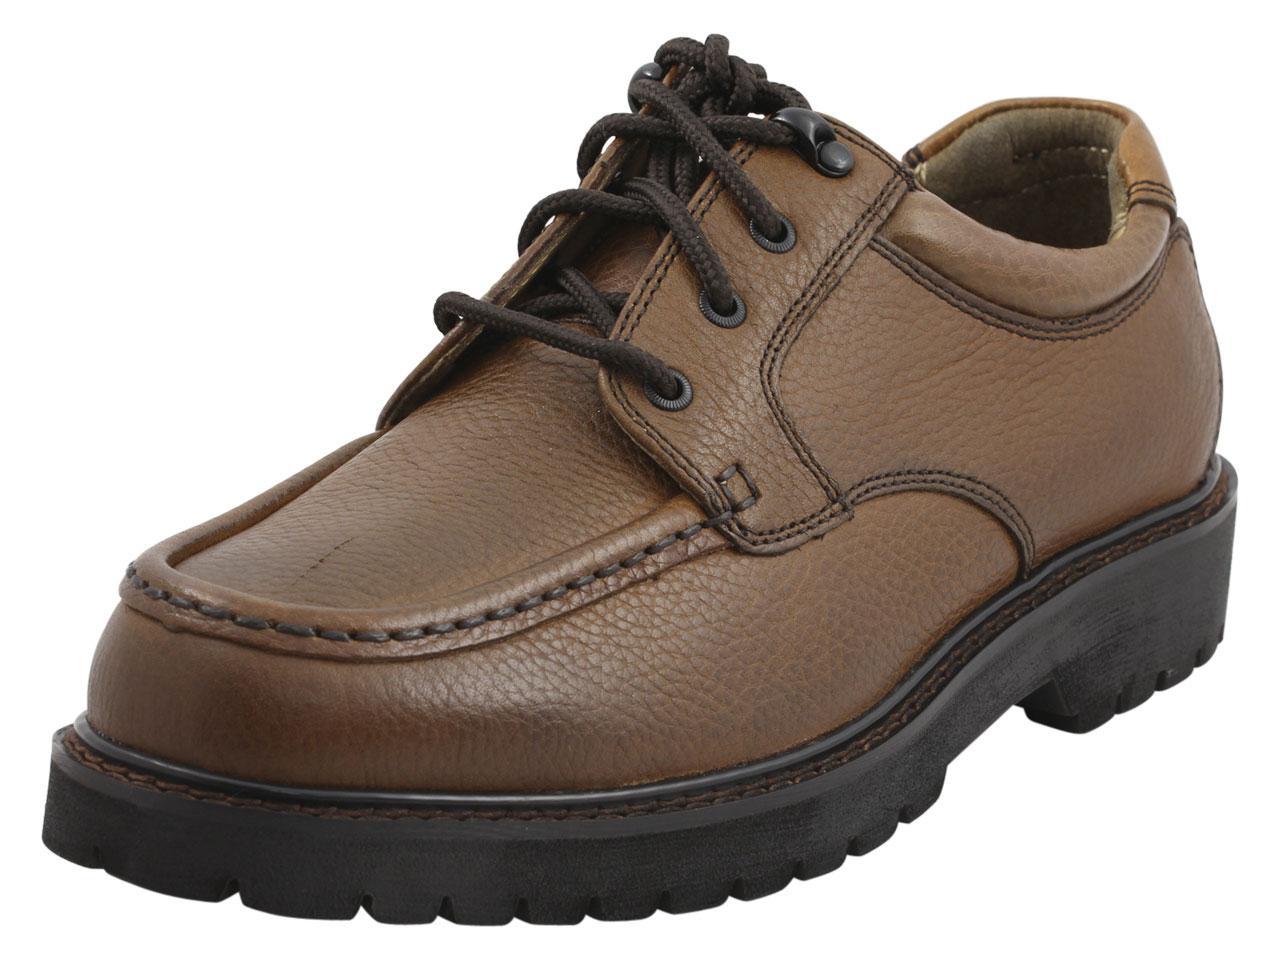 Image of Dockers Men's Glacier Memory Foam Oxfords Shoes - Brown - 8.5 E(W) US